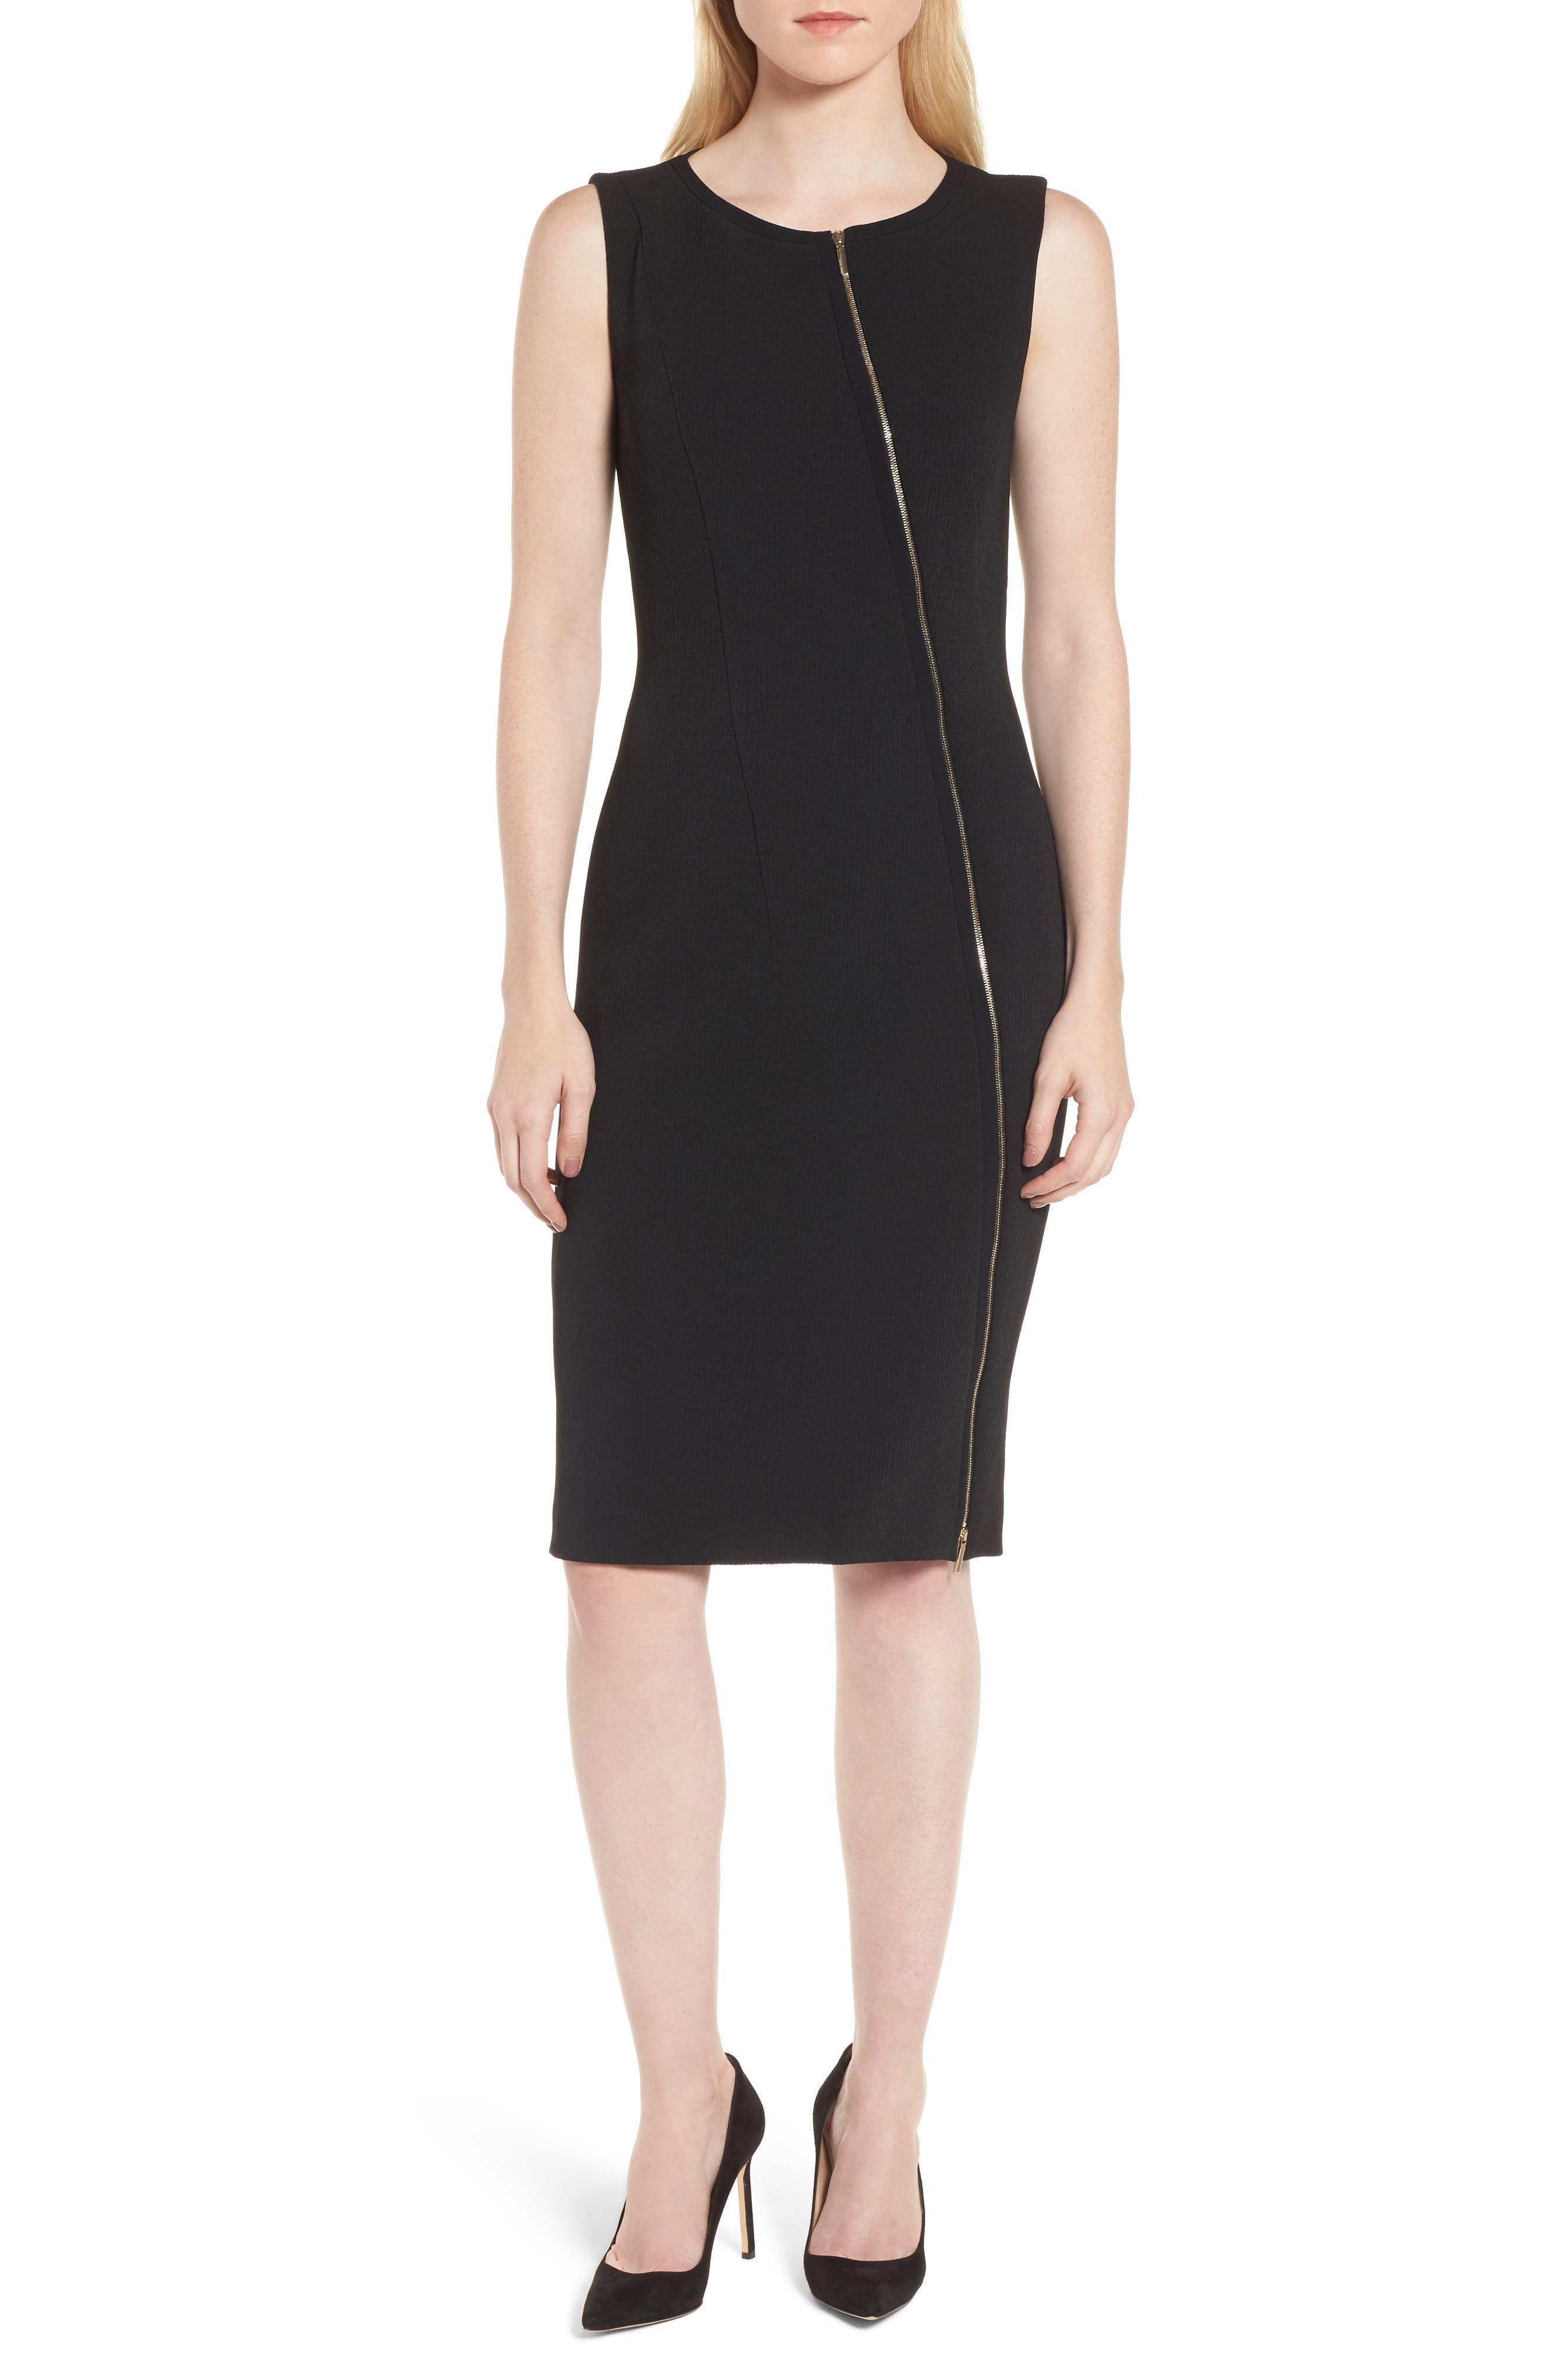 Danafea Dress,                             Main thumbnail 1, color,                             001